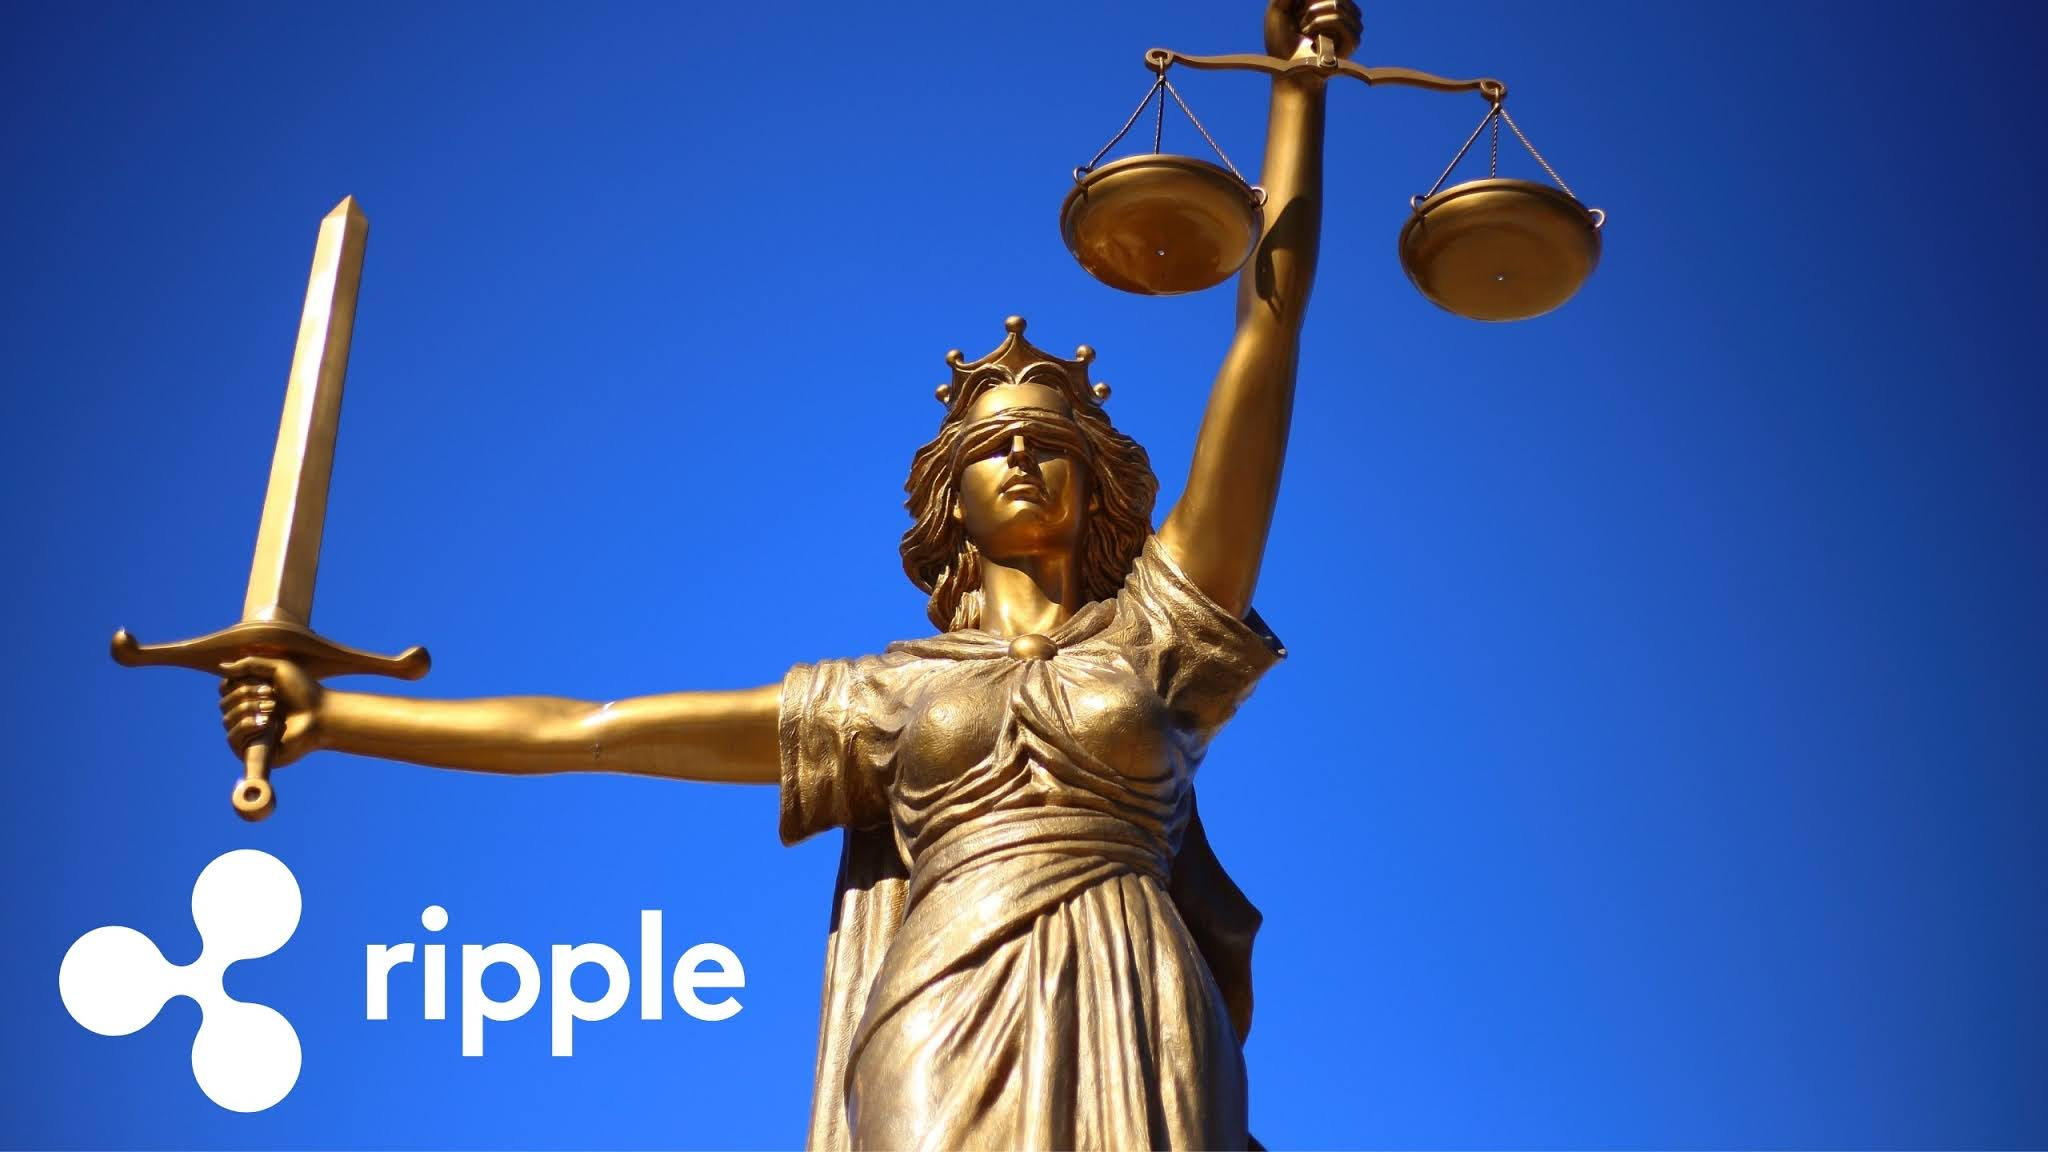 sec ripple xrp davası ne durumda